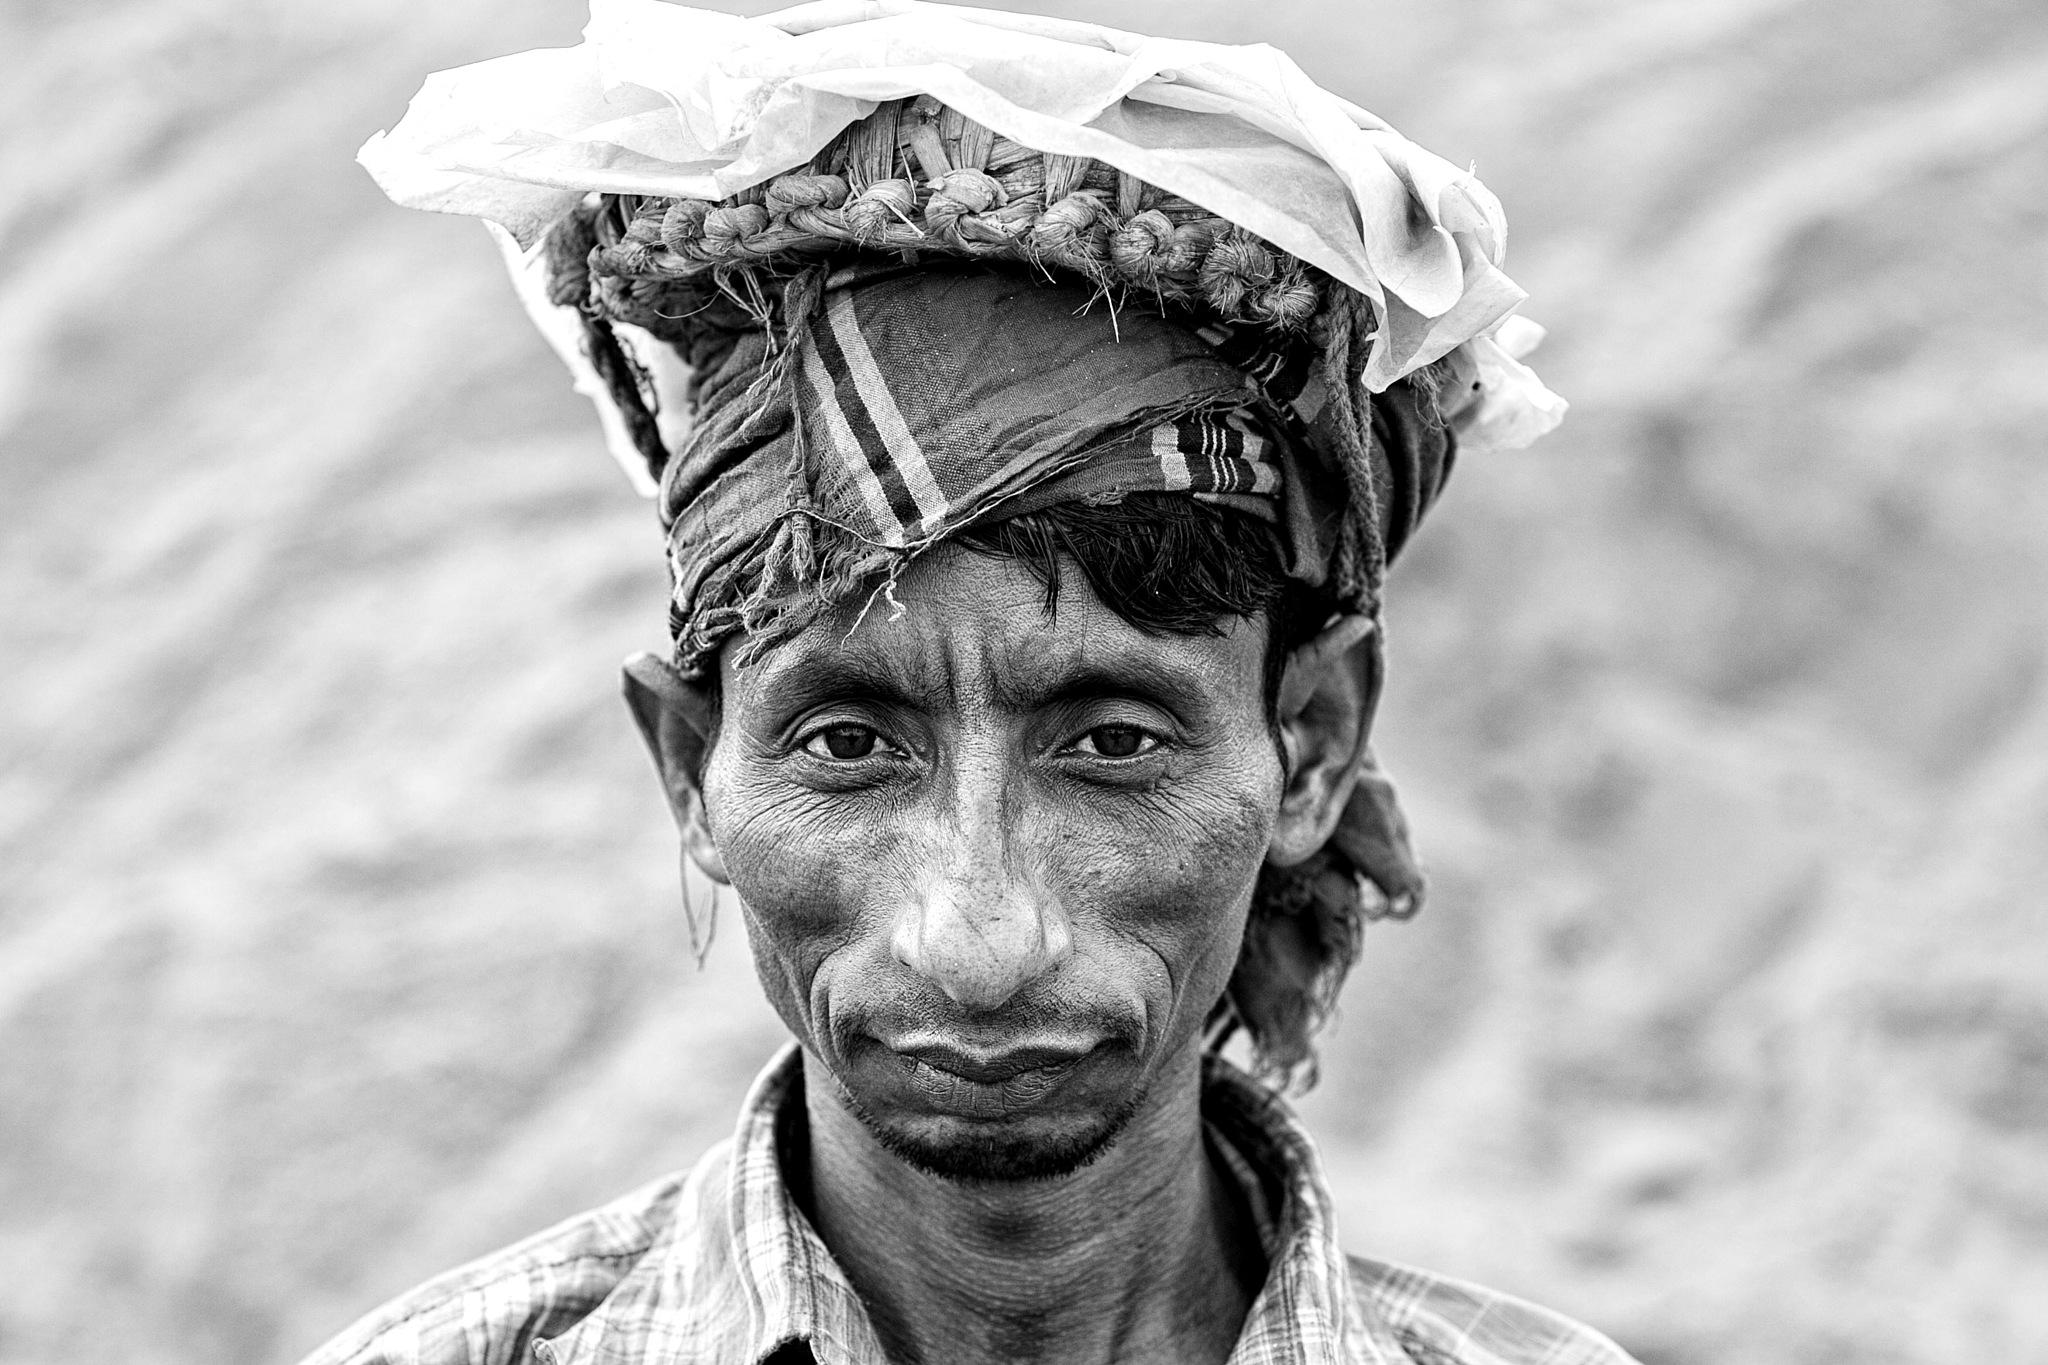 Soft Hat Guy by Mahesh Krishnamurthy